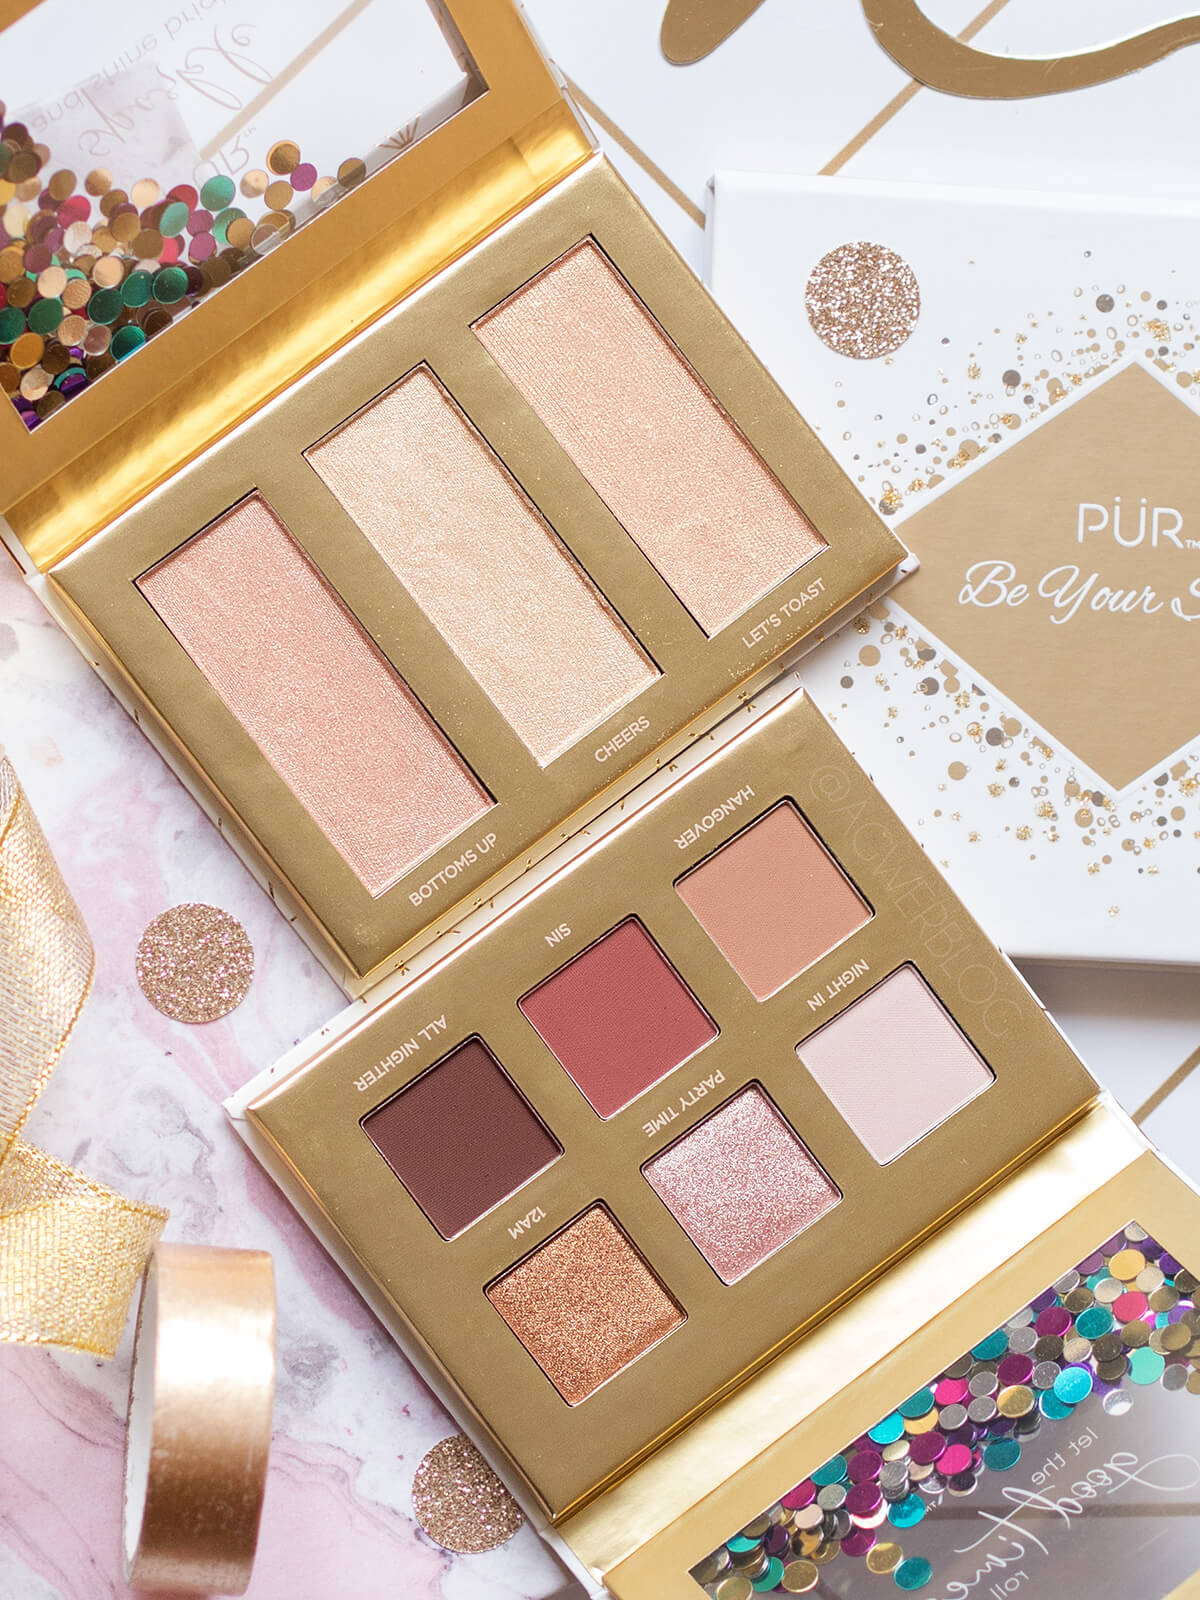 PÜR Cosmetics sparkle ans shine bright